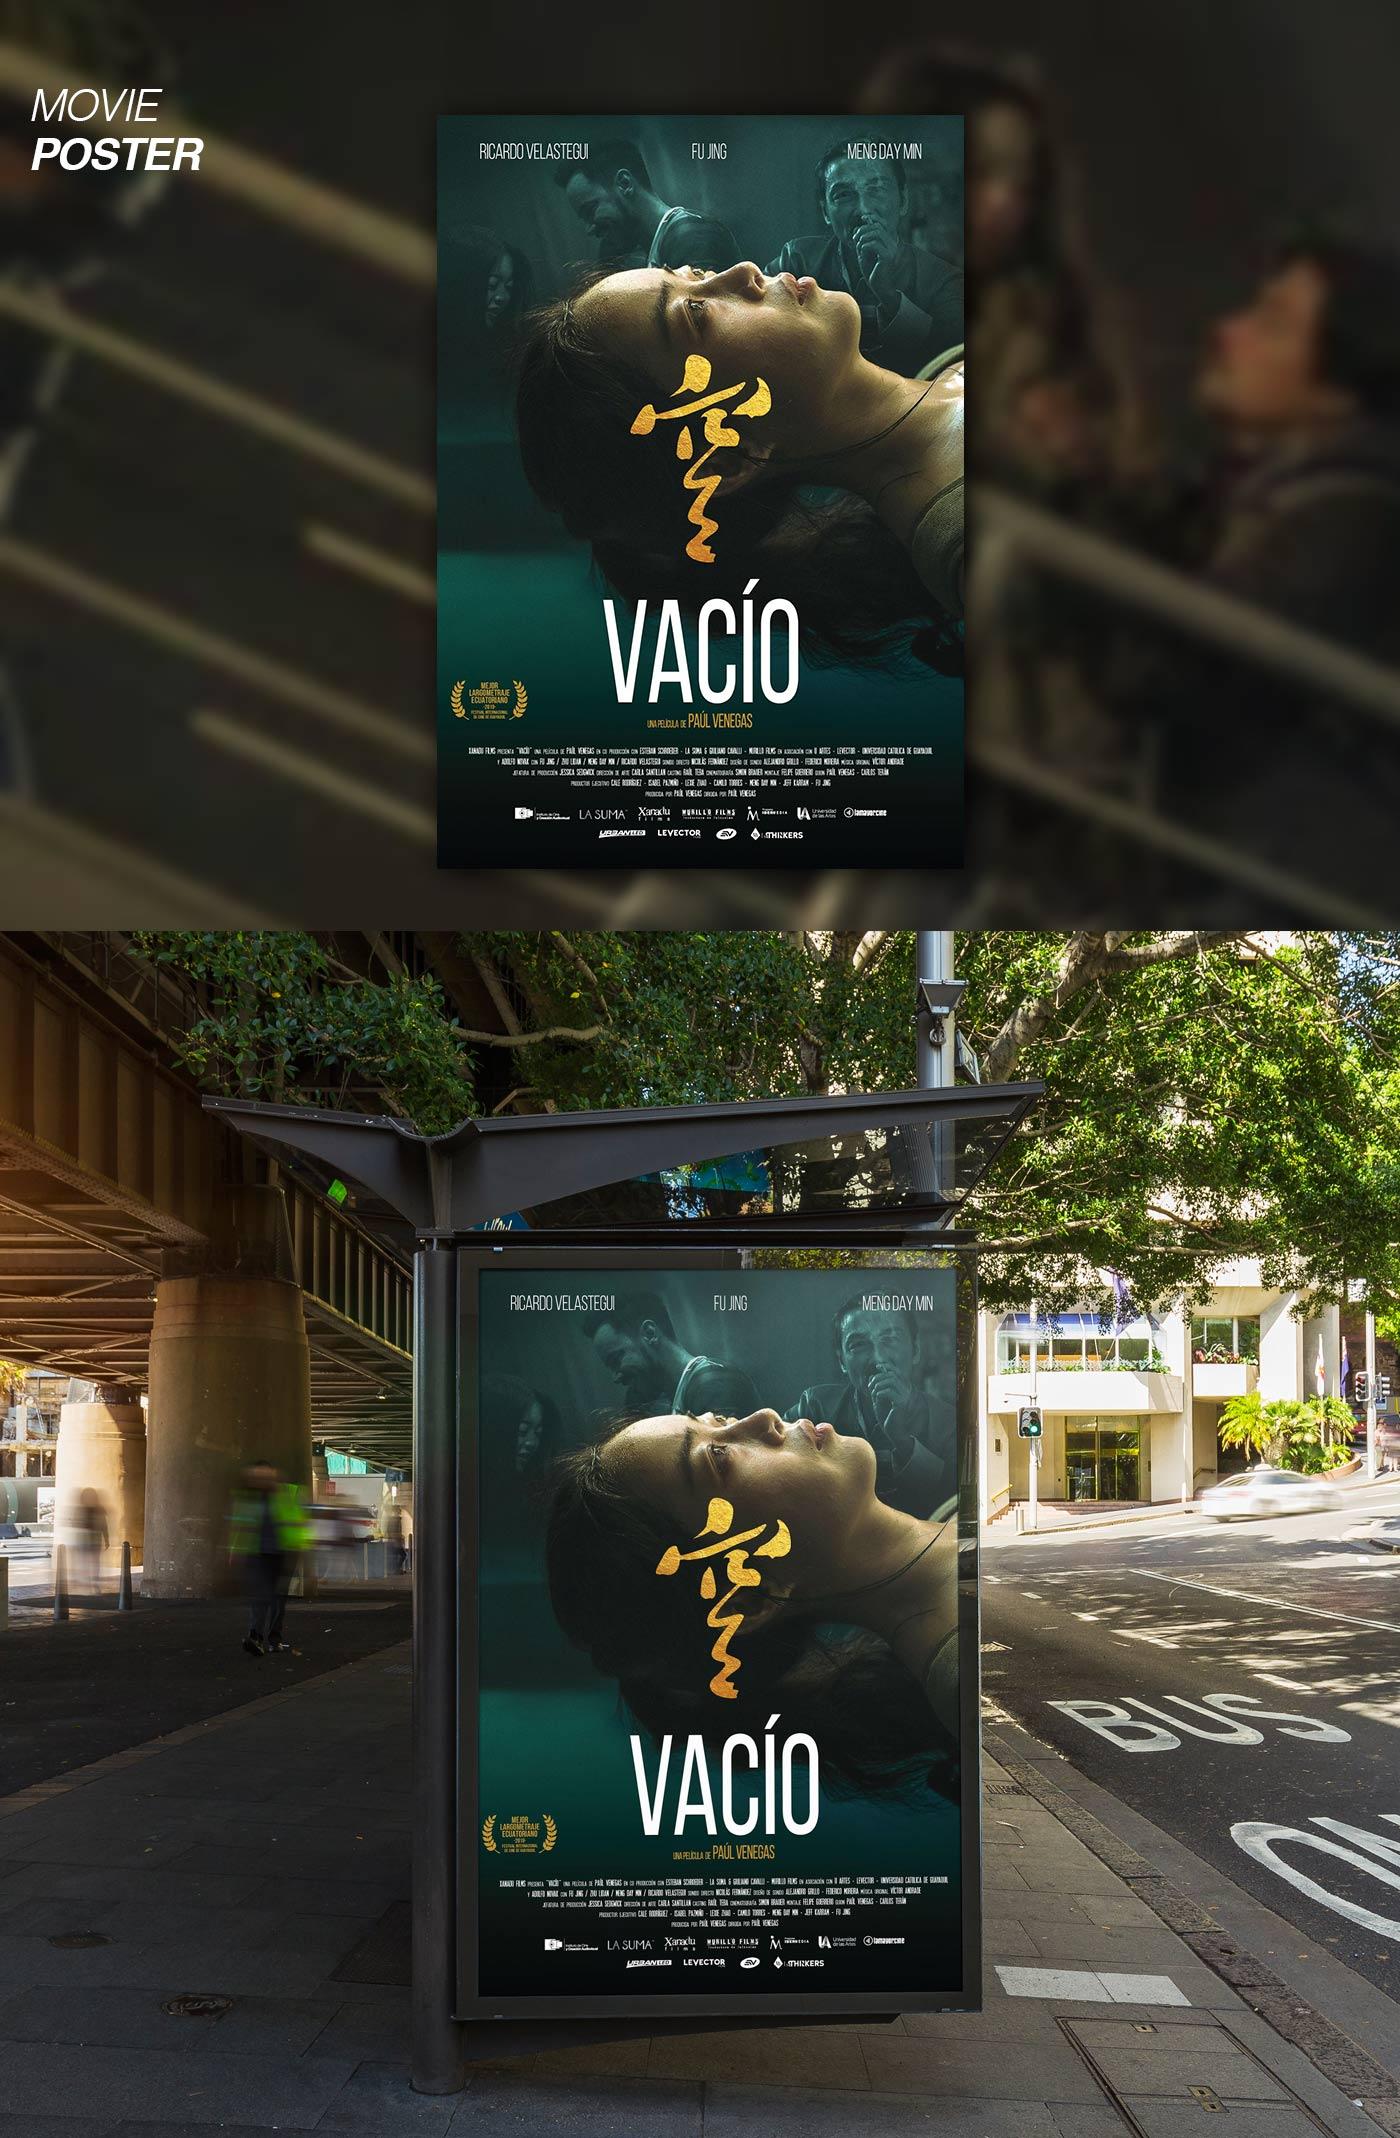 Afiche-de-pelicula-vacio-pelicula-ecuatoriana